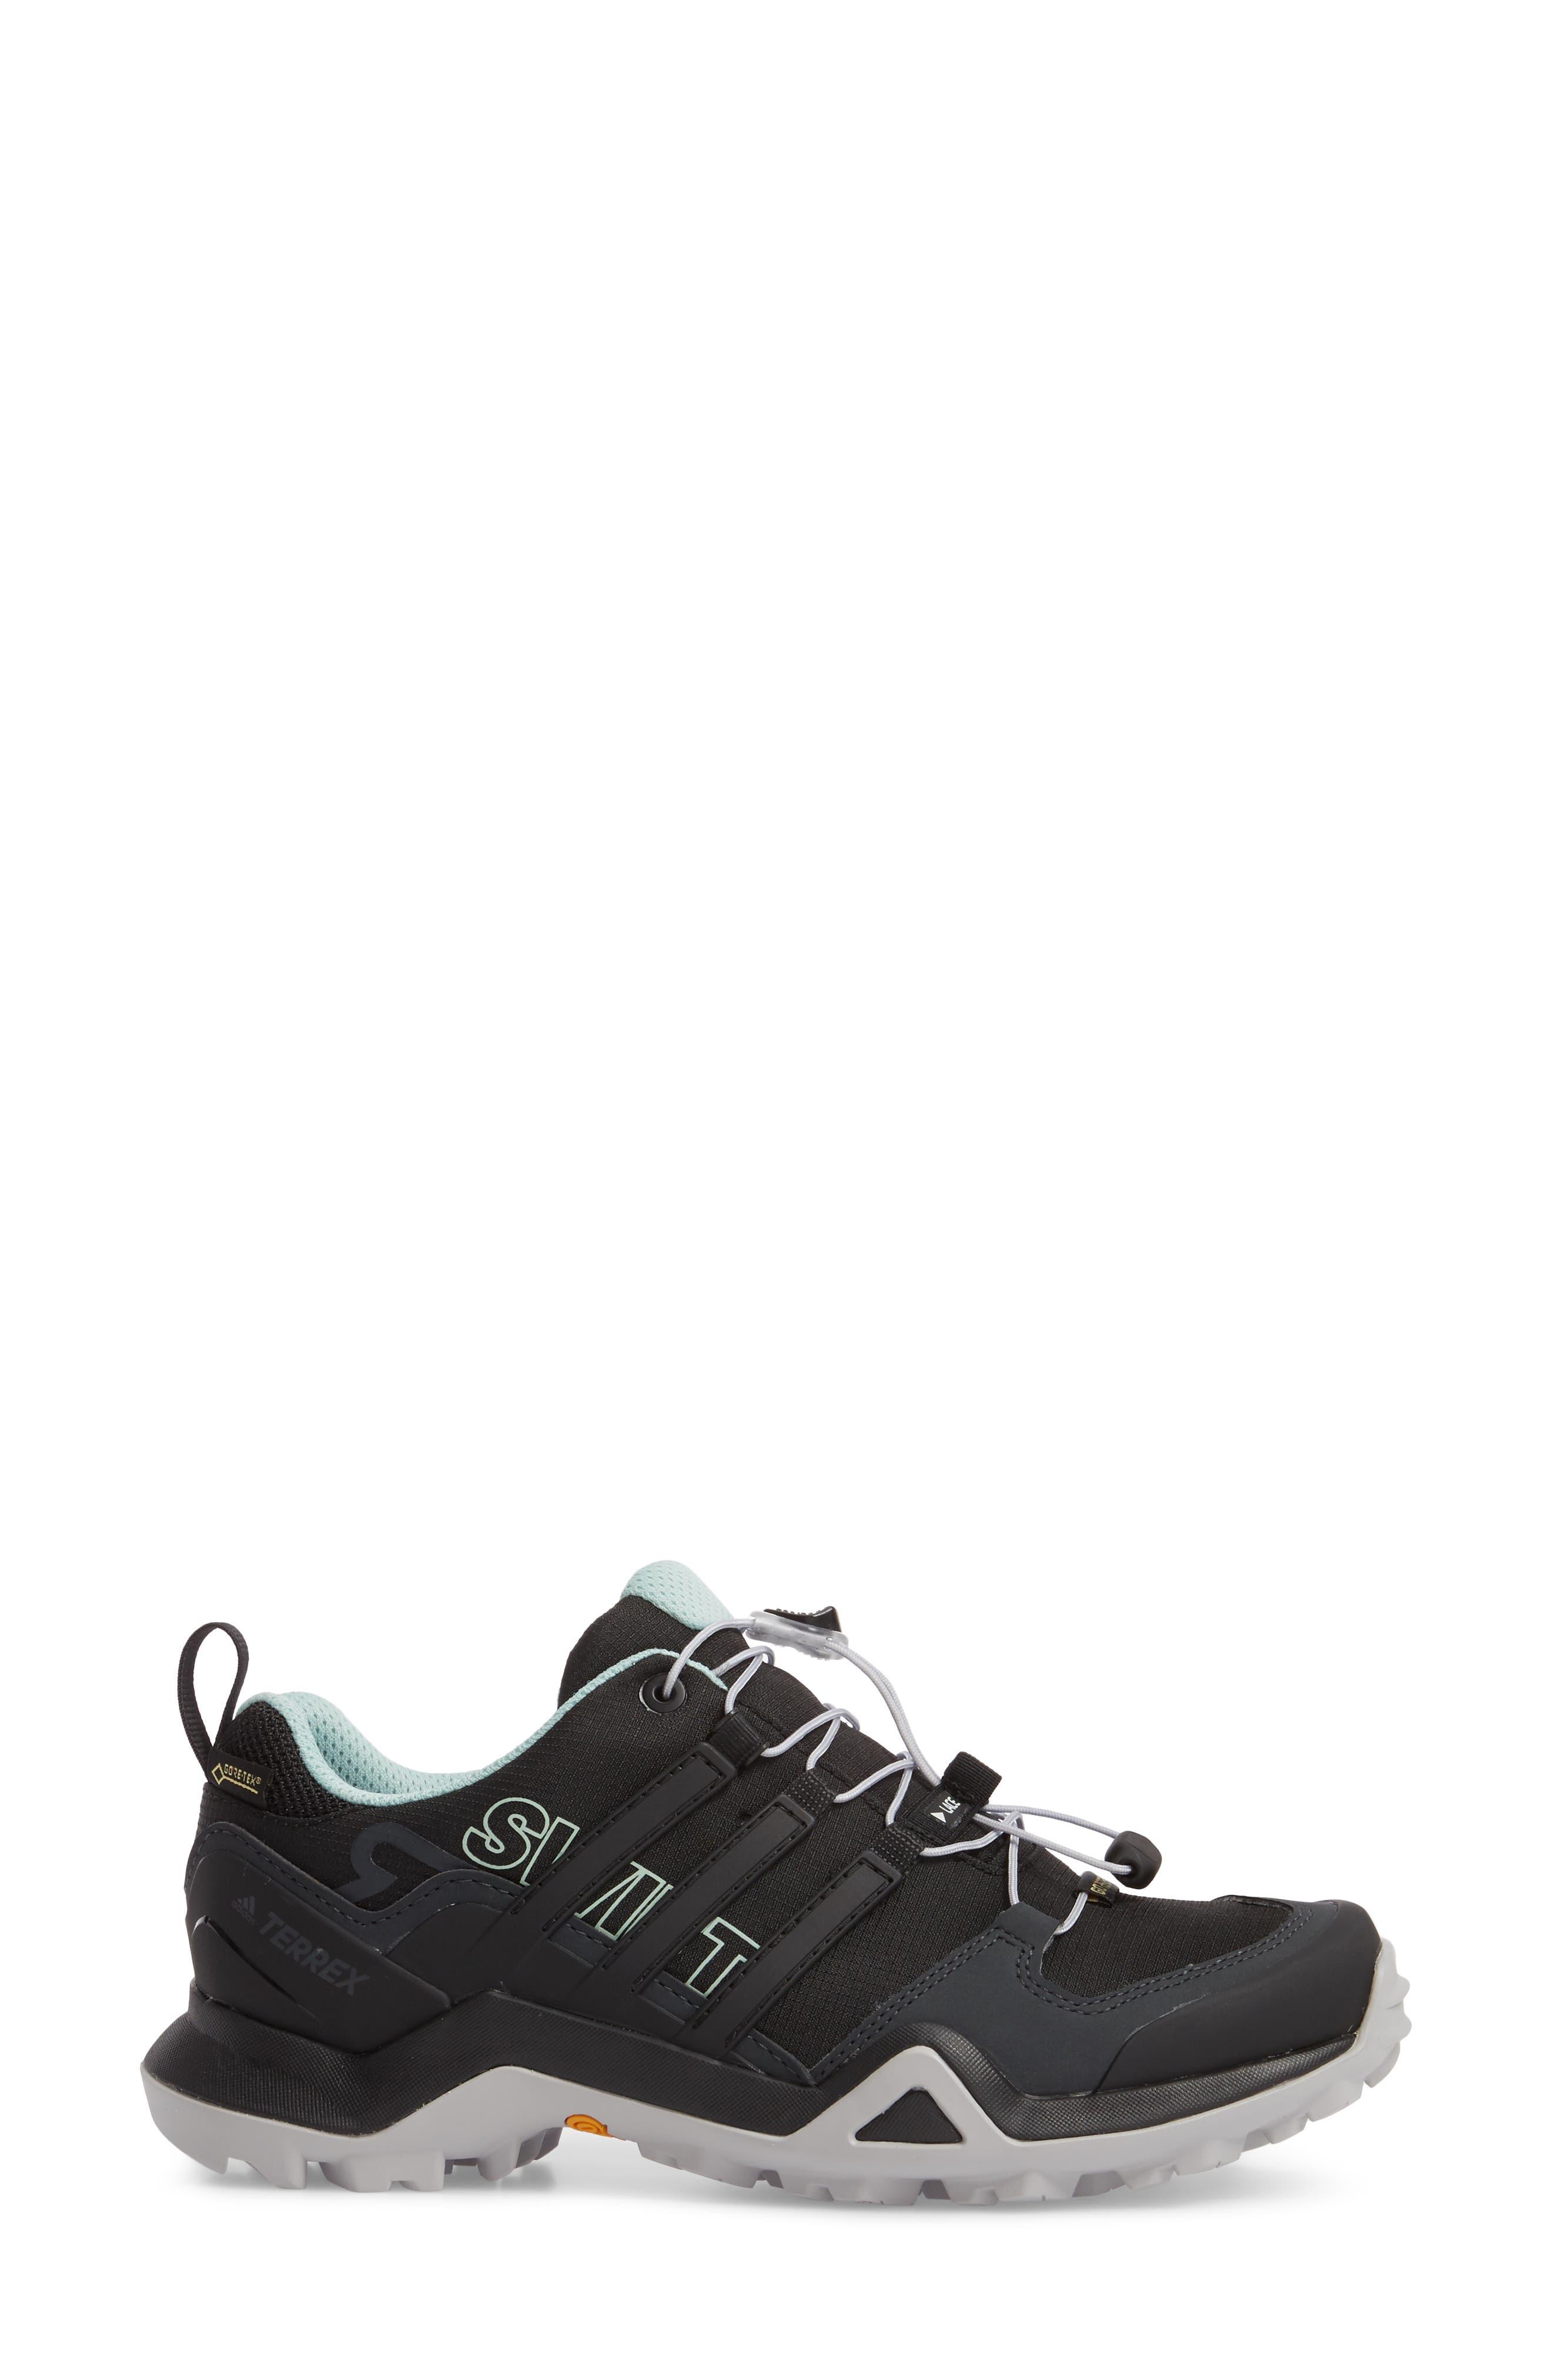 Terrex Swift R2 Gore-Tex<sup>®</sup> Hiking Shoe,                             Alternate thumbnail 3, color,                             Black/ Black/ Ash Green